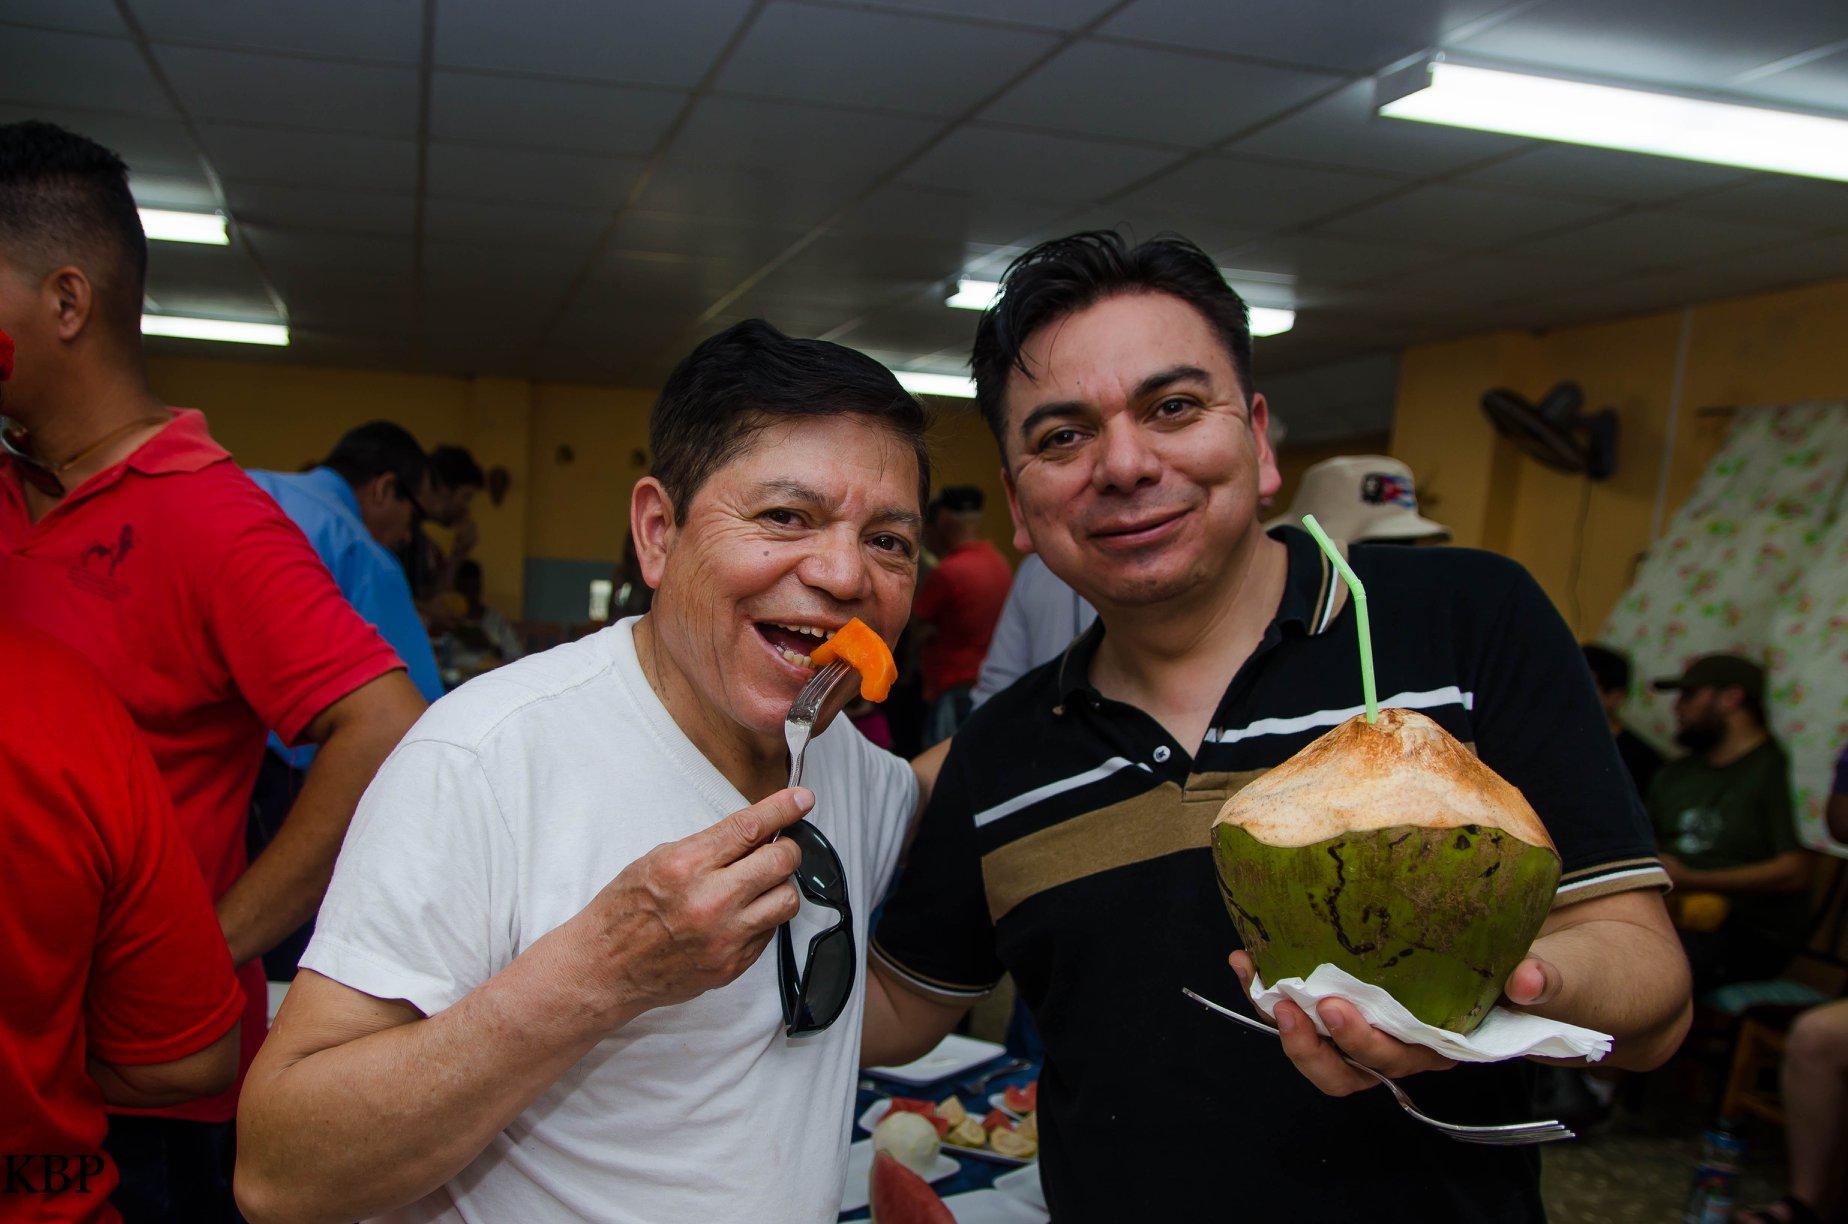 DidUeverdrinkacoconut